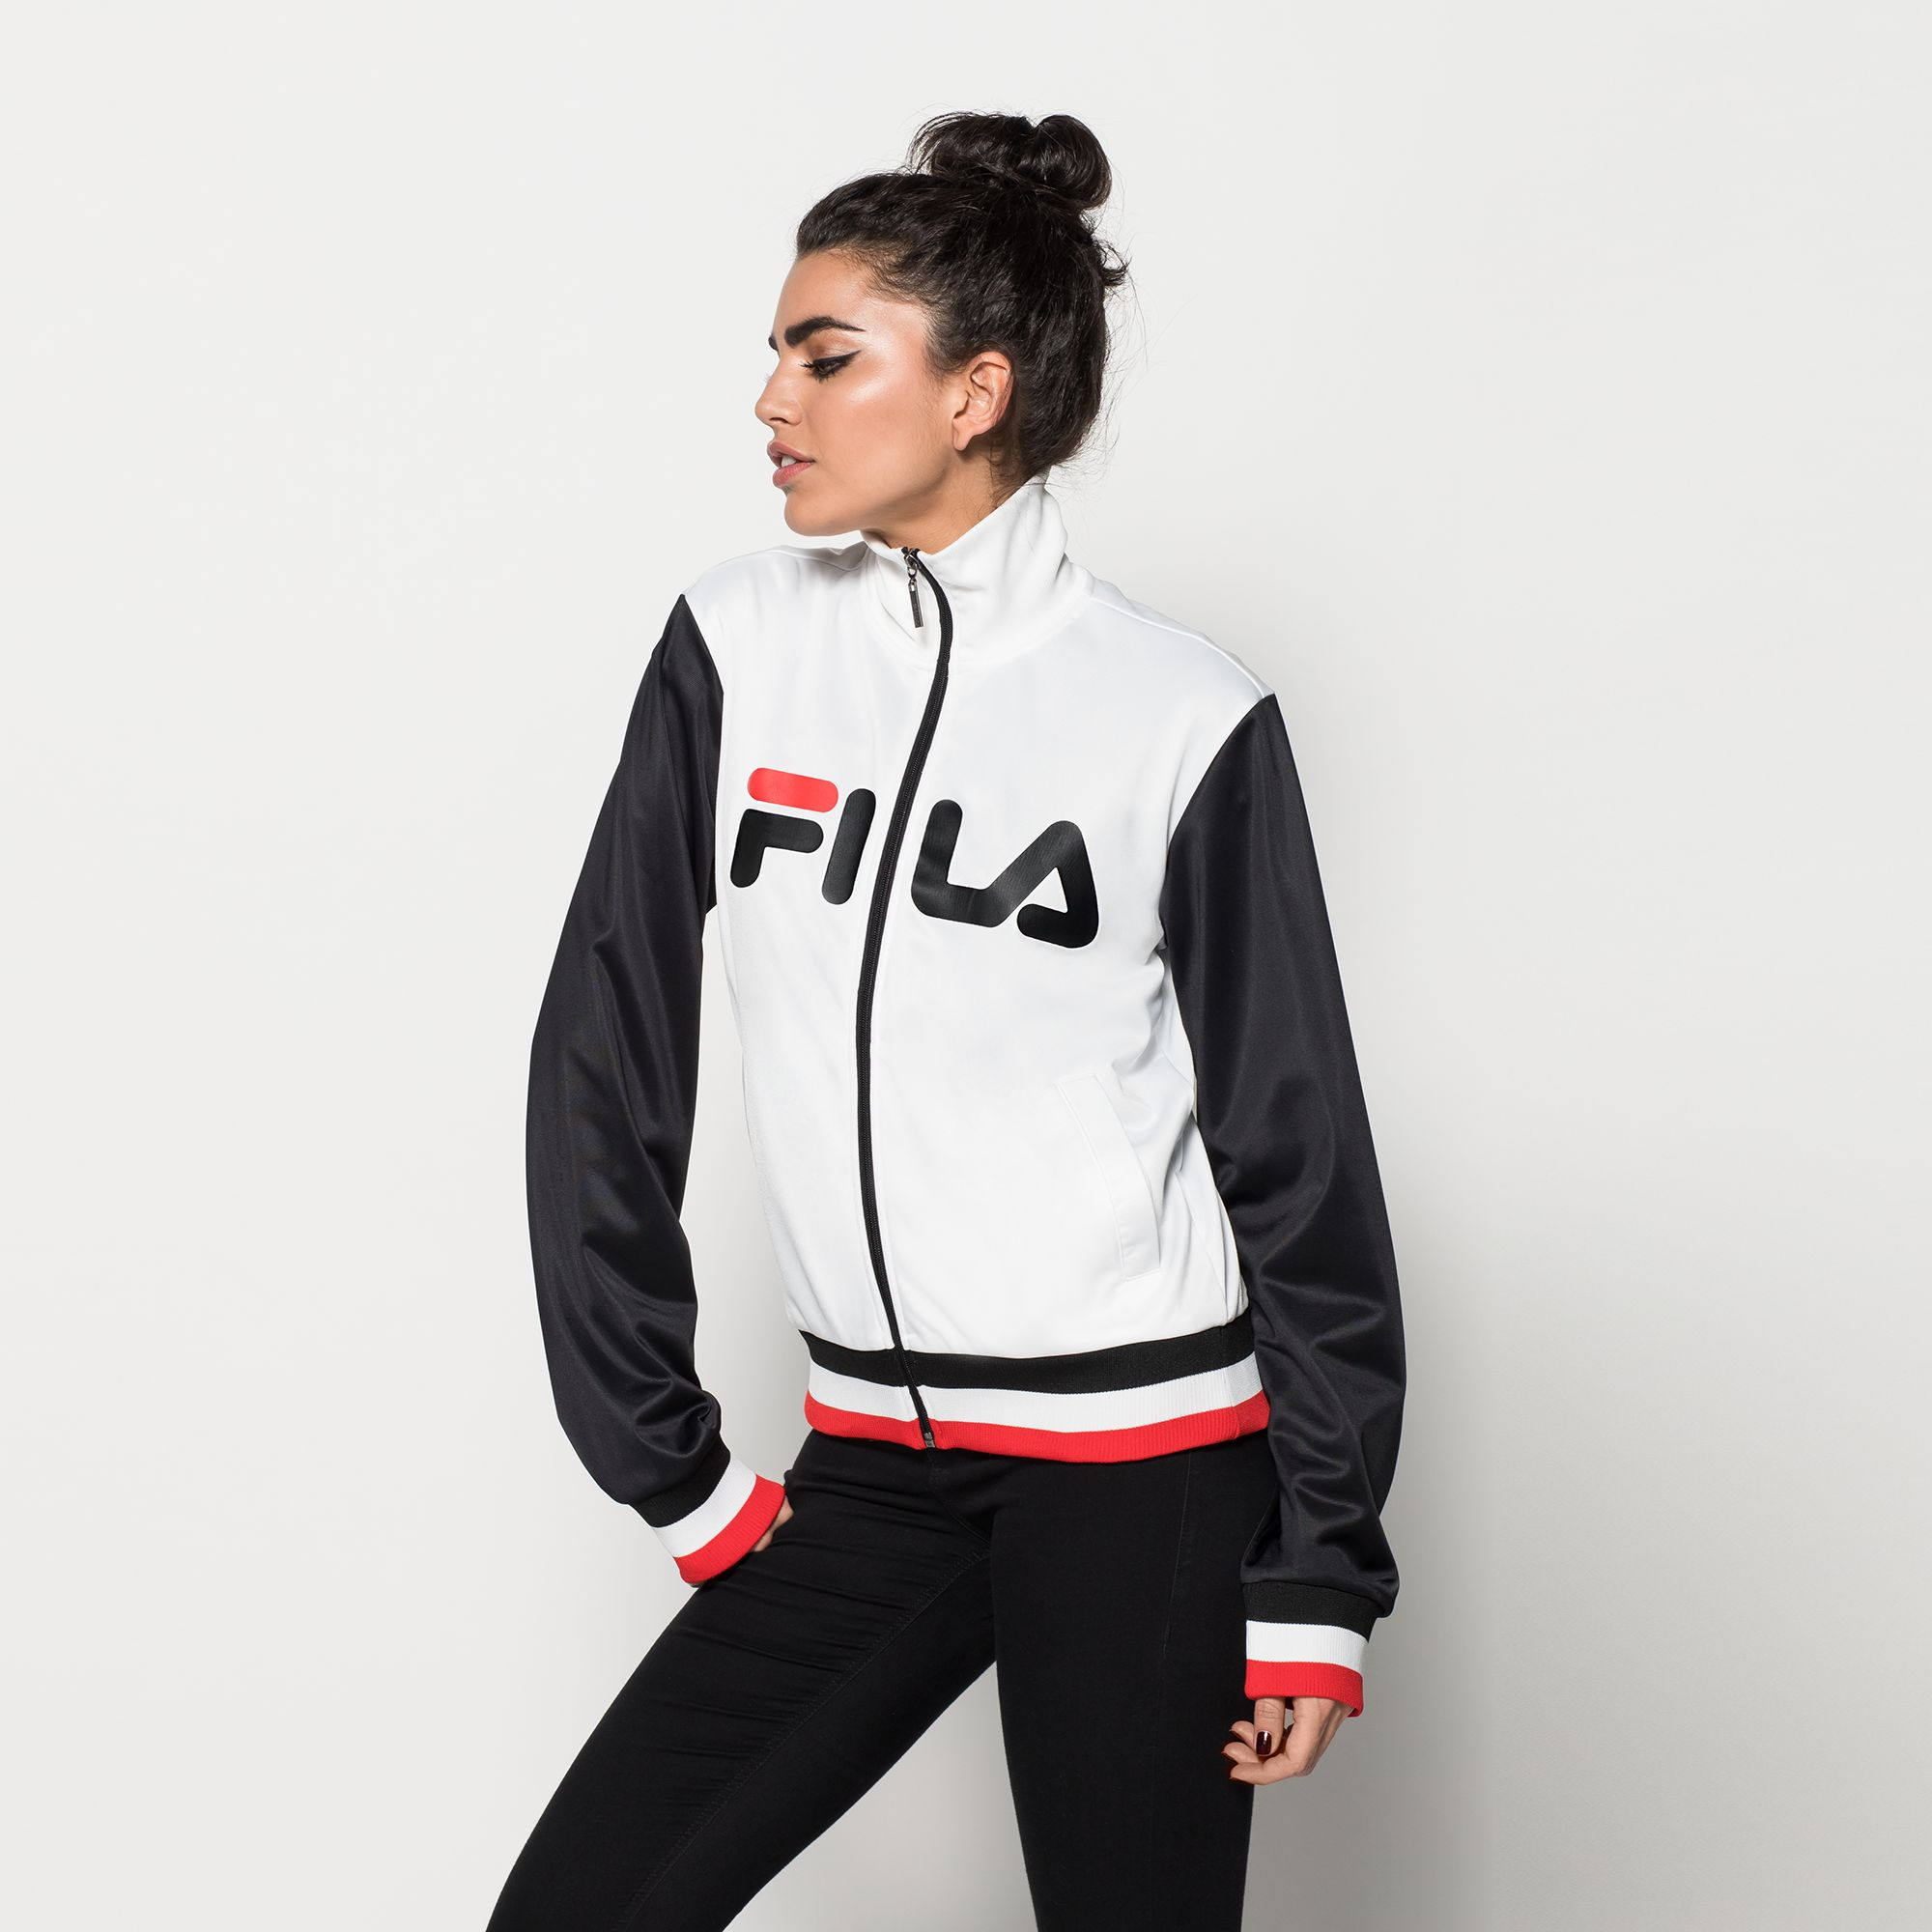 Track Jacket bei FILA